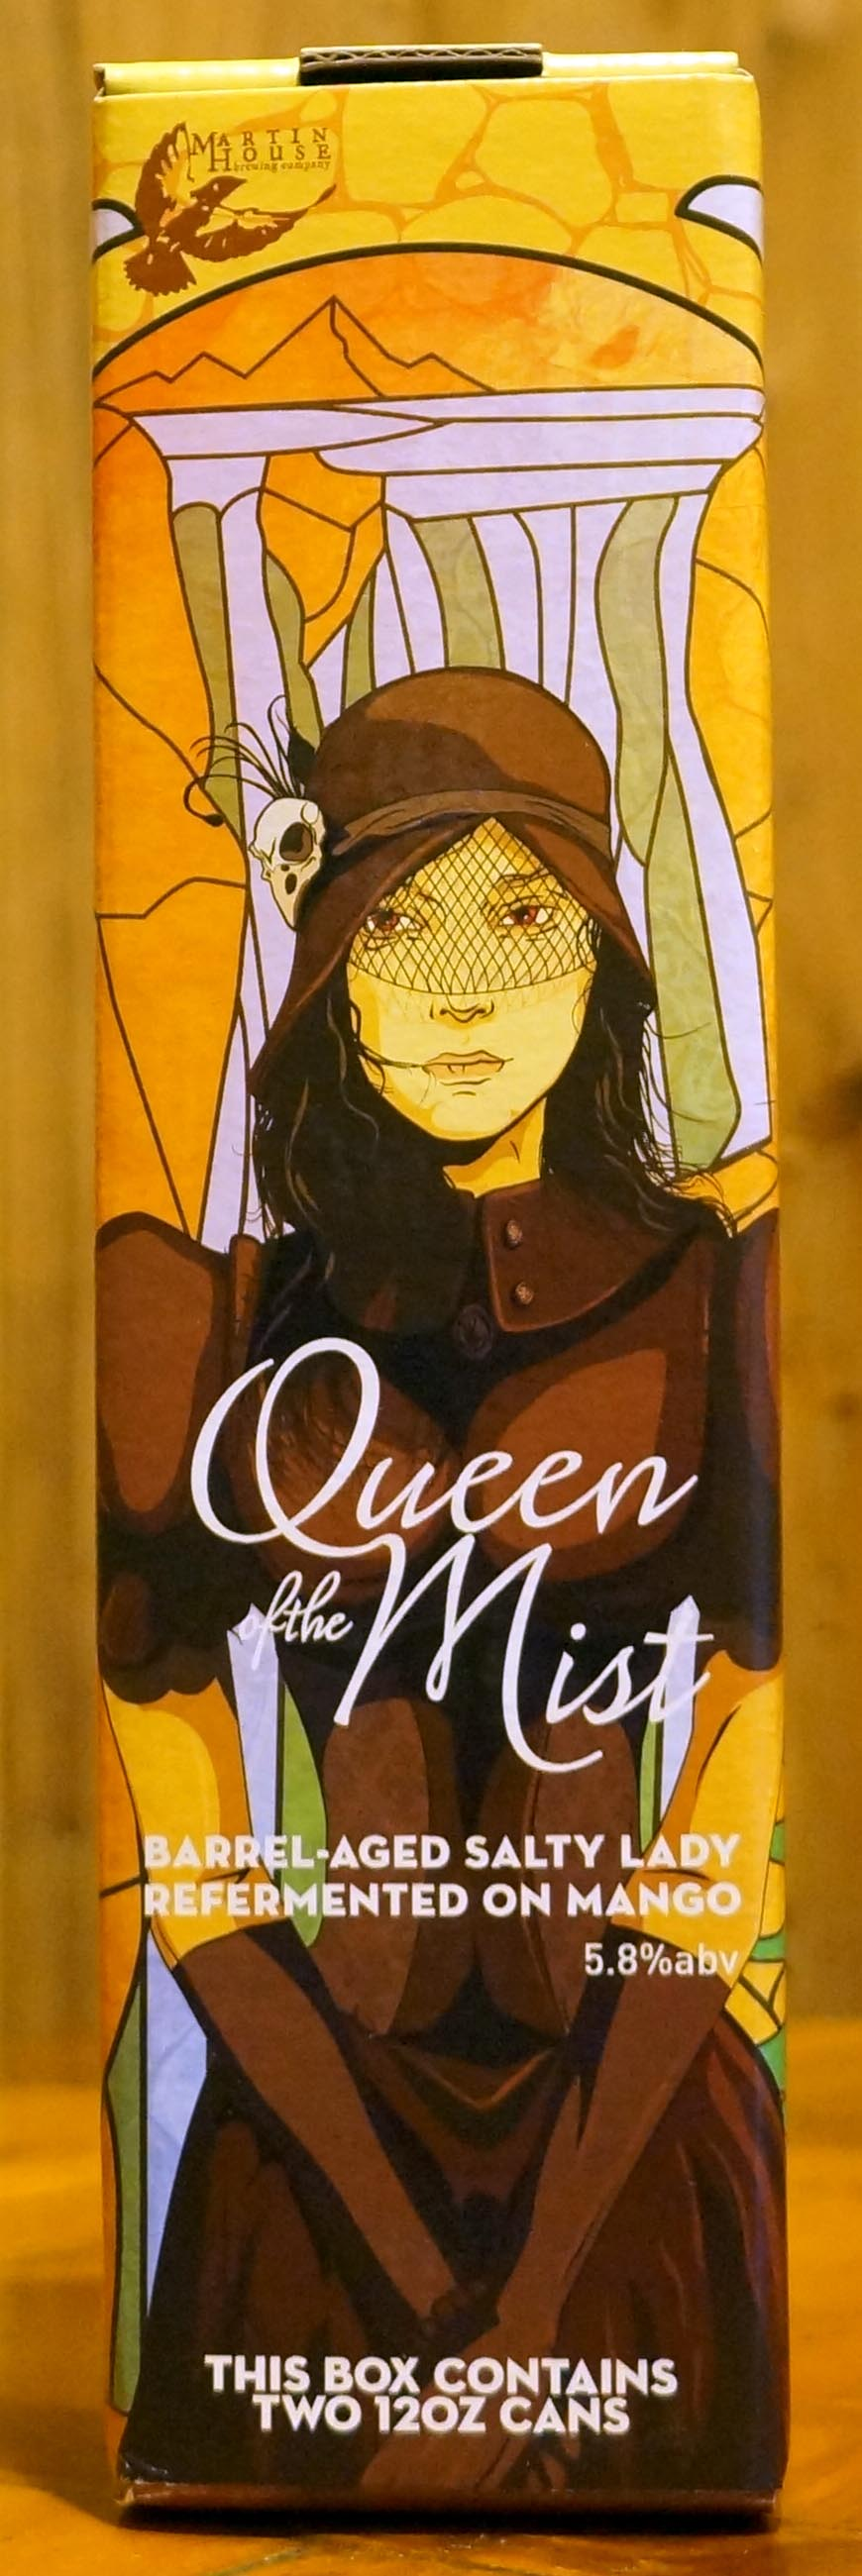 MH_QueenMist.jpg